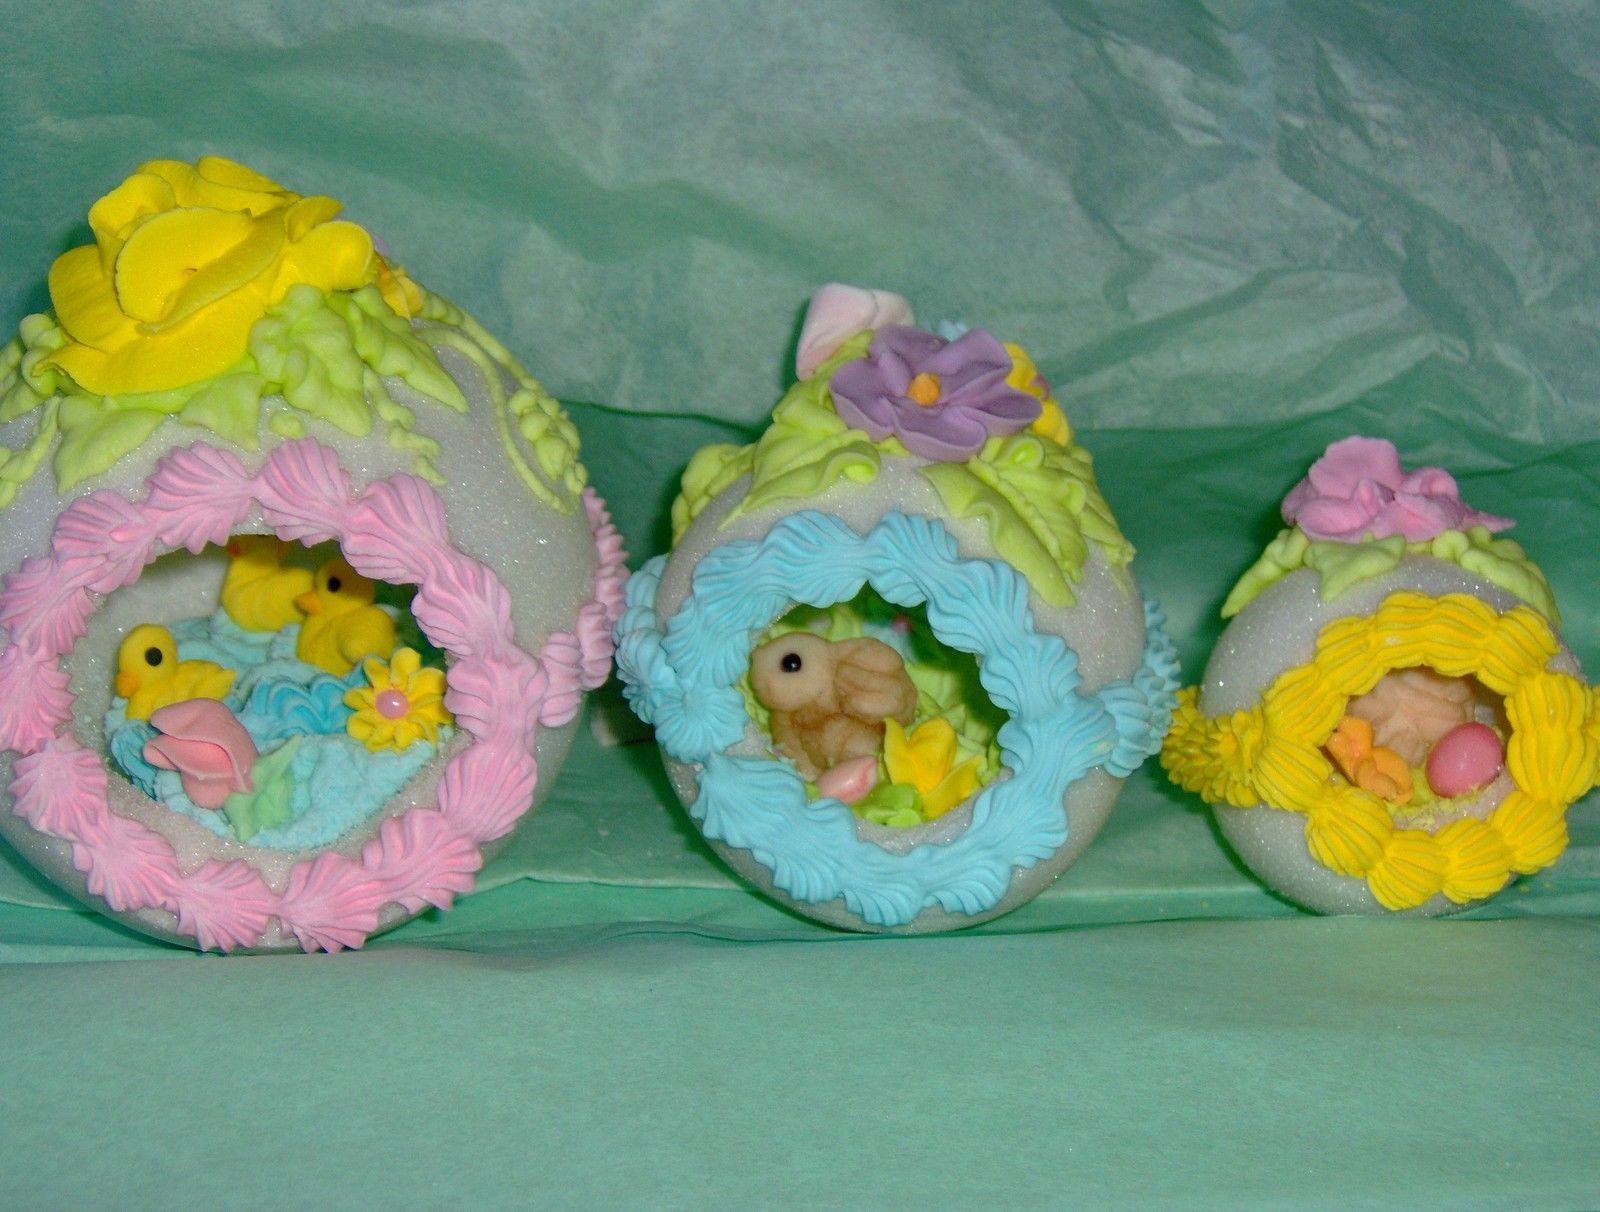 Med Size Decorative Sugar Easter Egg Enchanting Sugar Scene Inside So Pretty   eBay